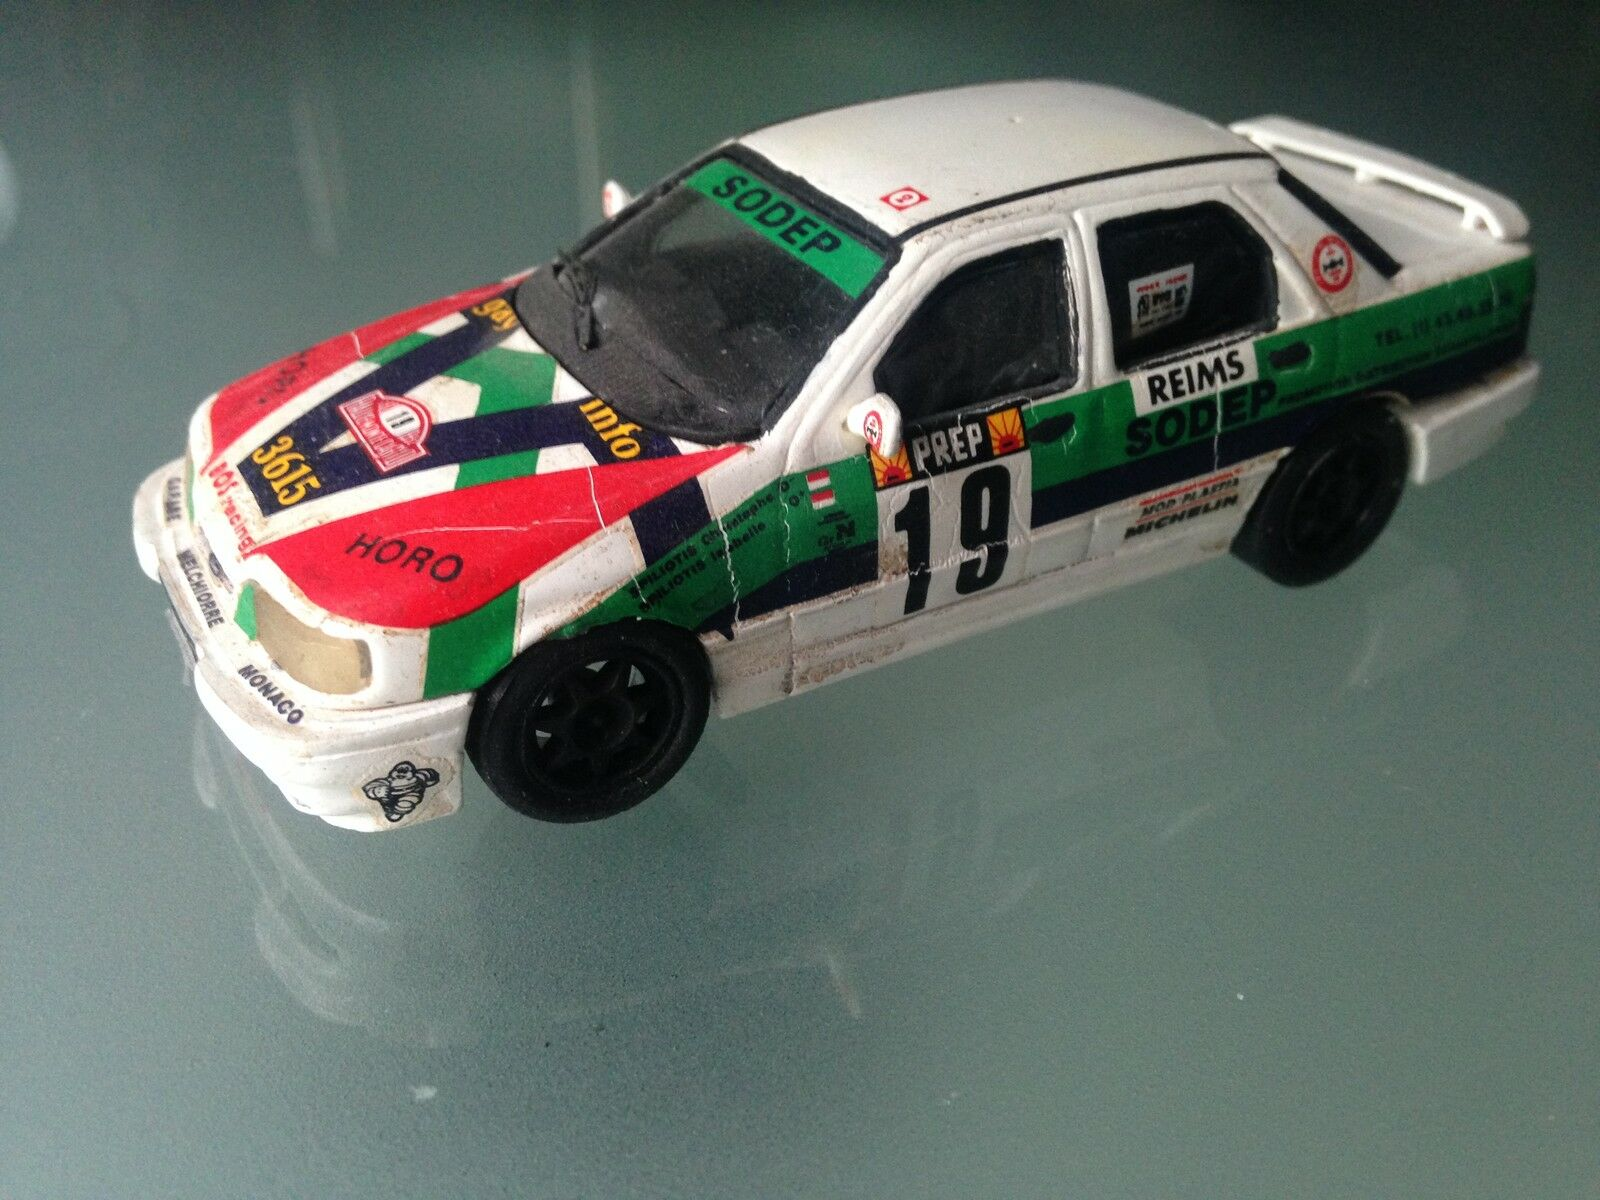 1/43 KIT TRON FORD SIERRA N 19 SPILIOTIS Rally WRC MONTE CARLO 1992 MONTECARLO